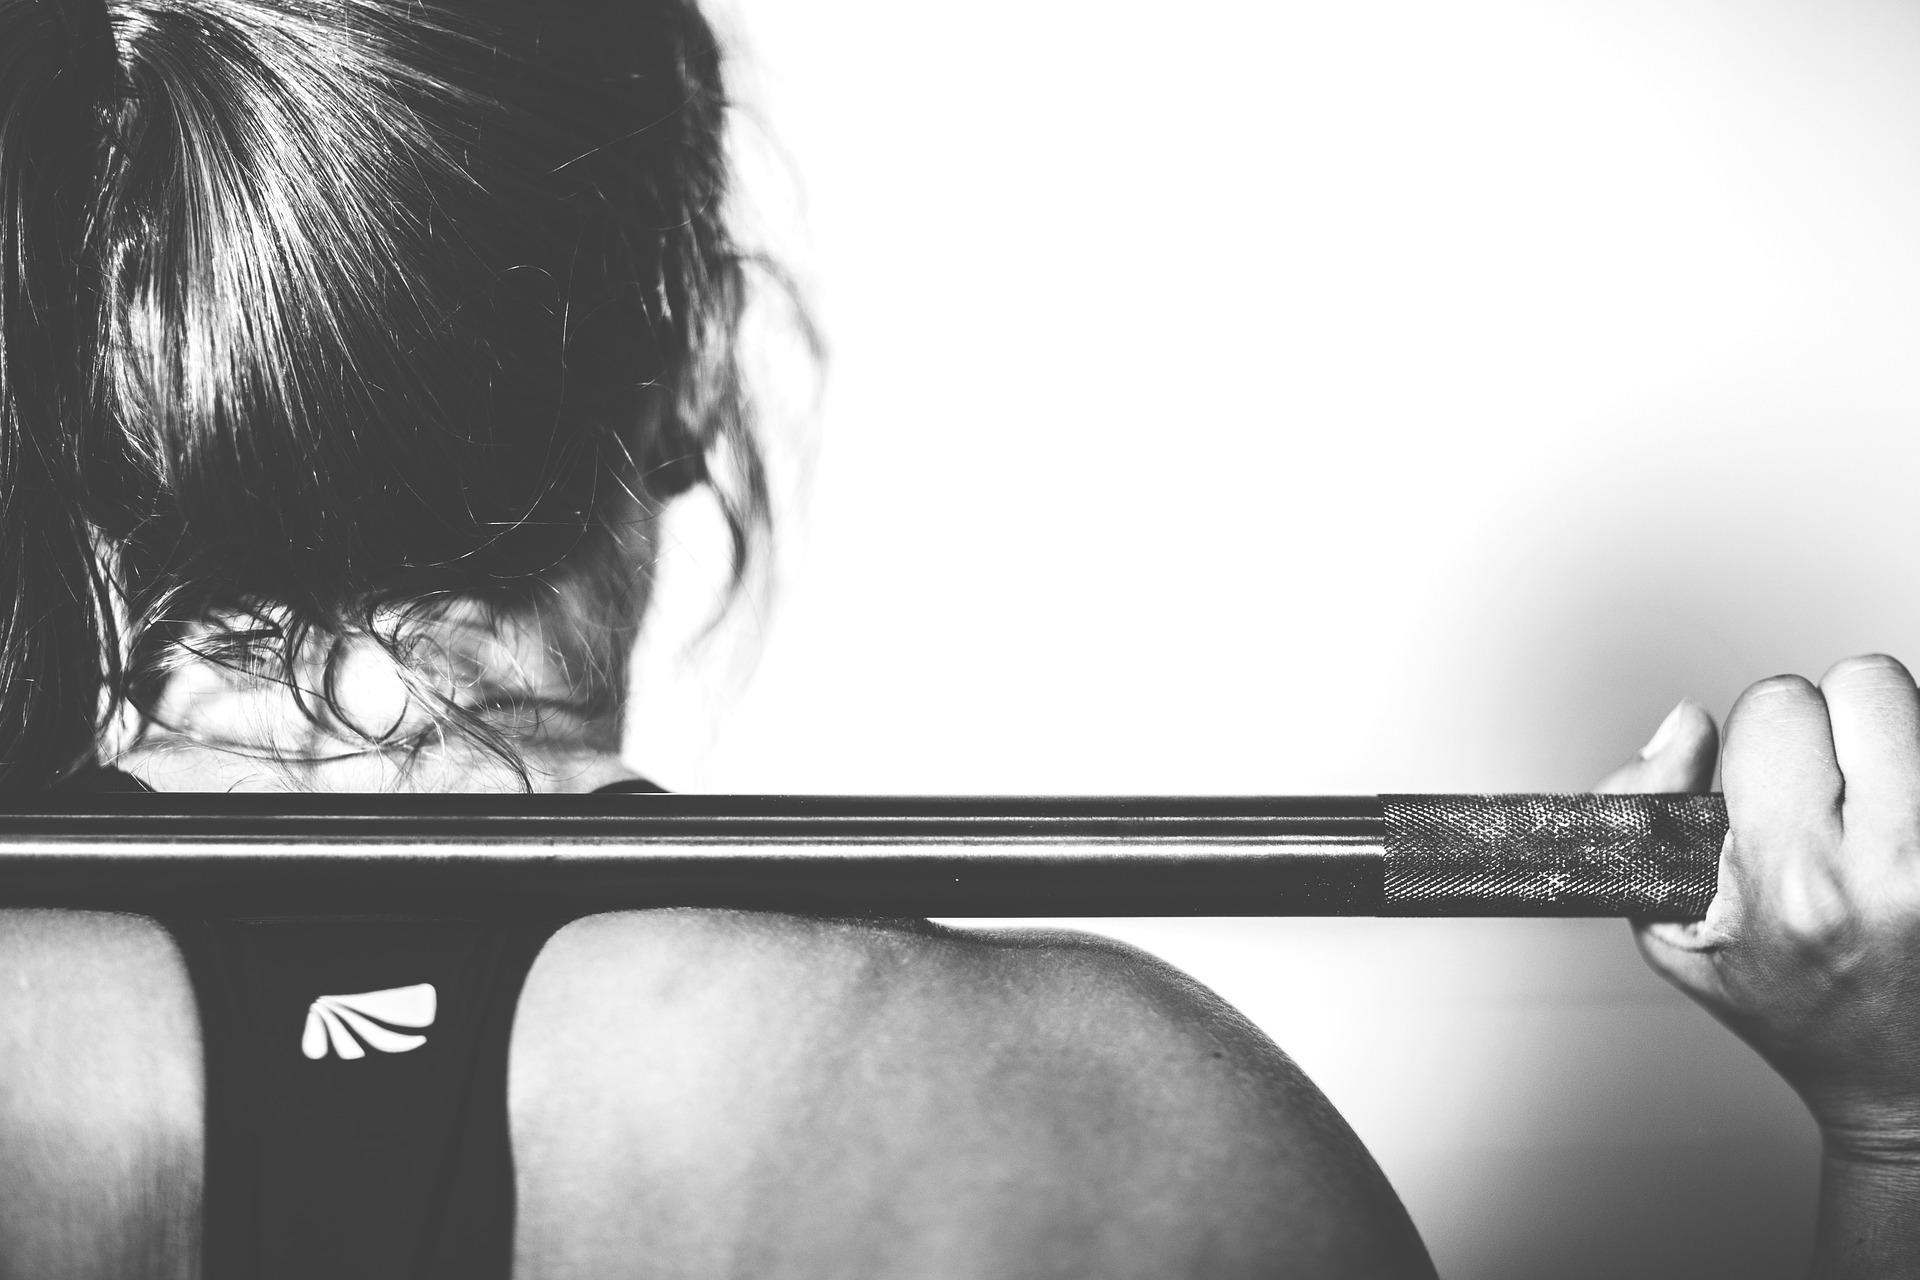 тренировка зал штанга спорт девушка